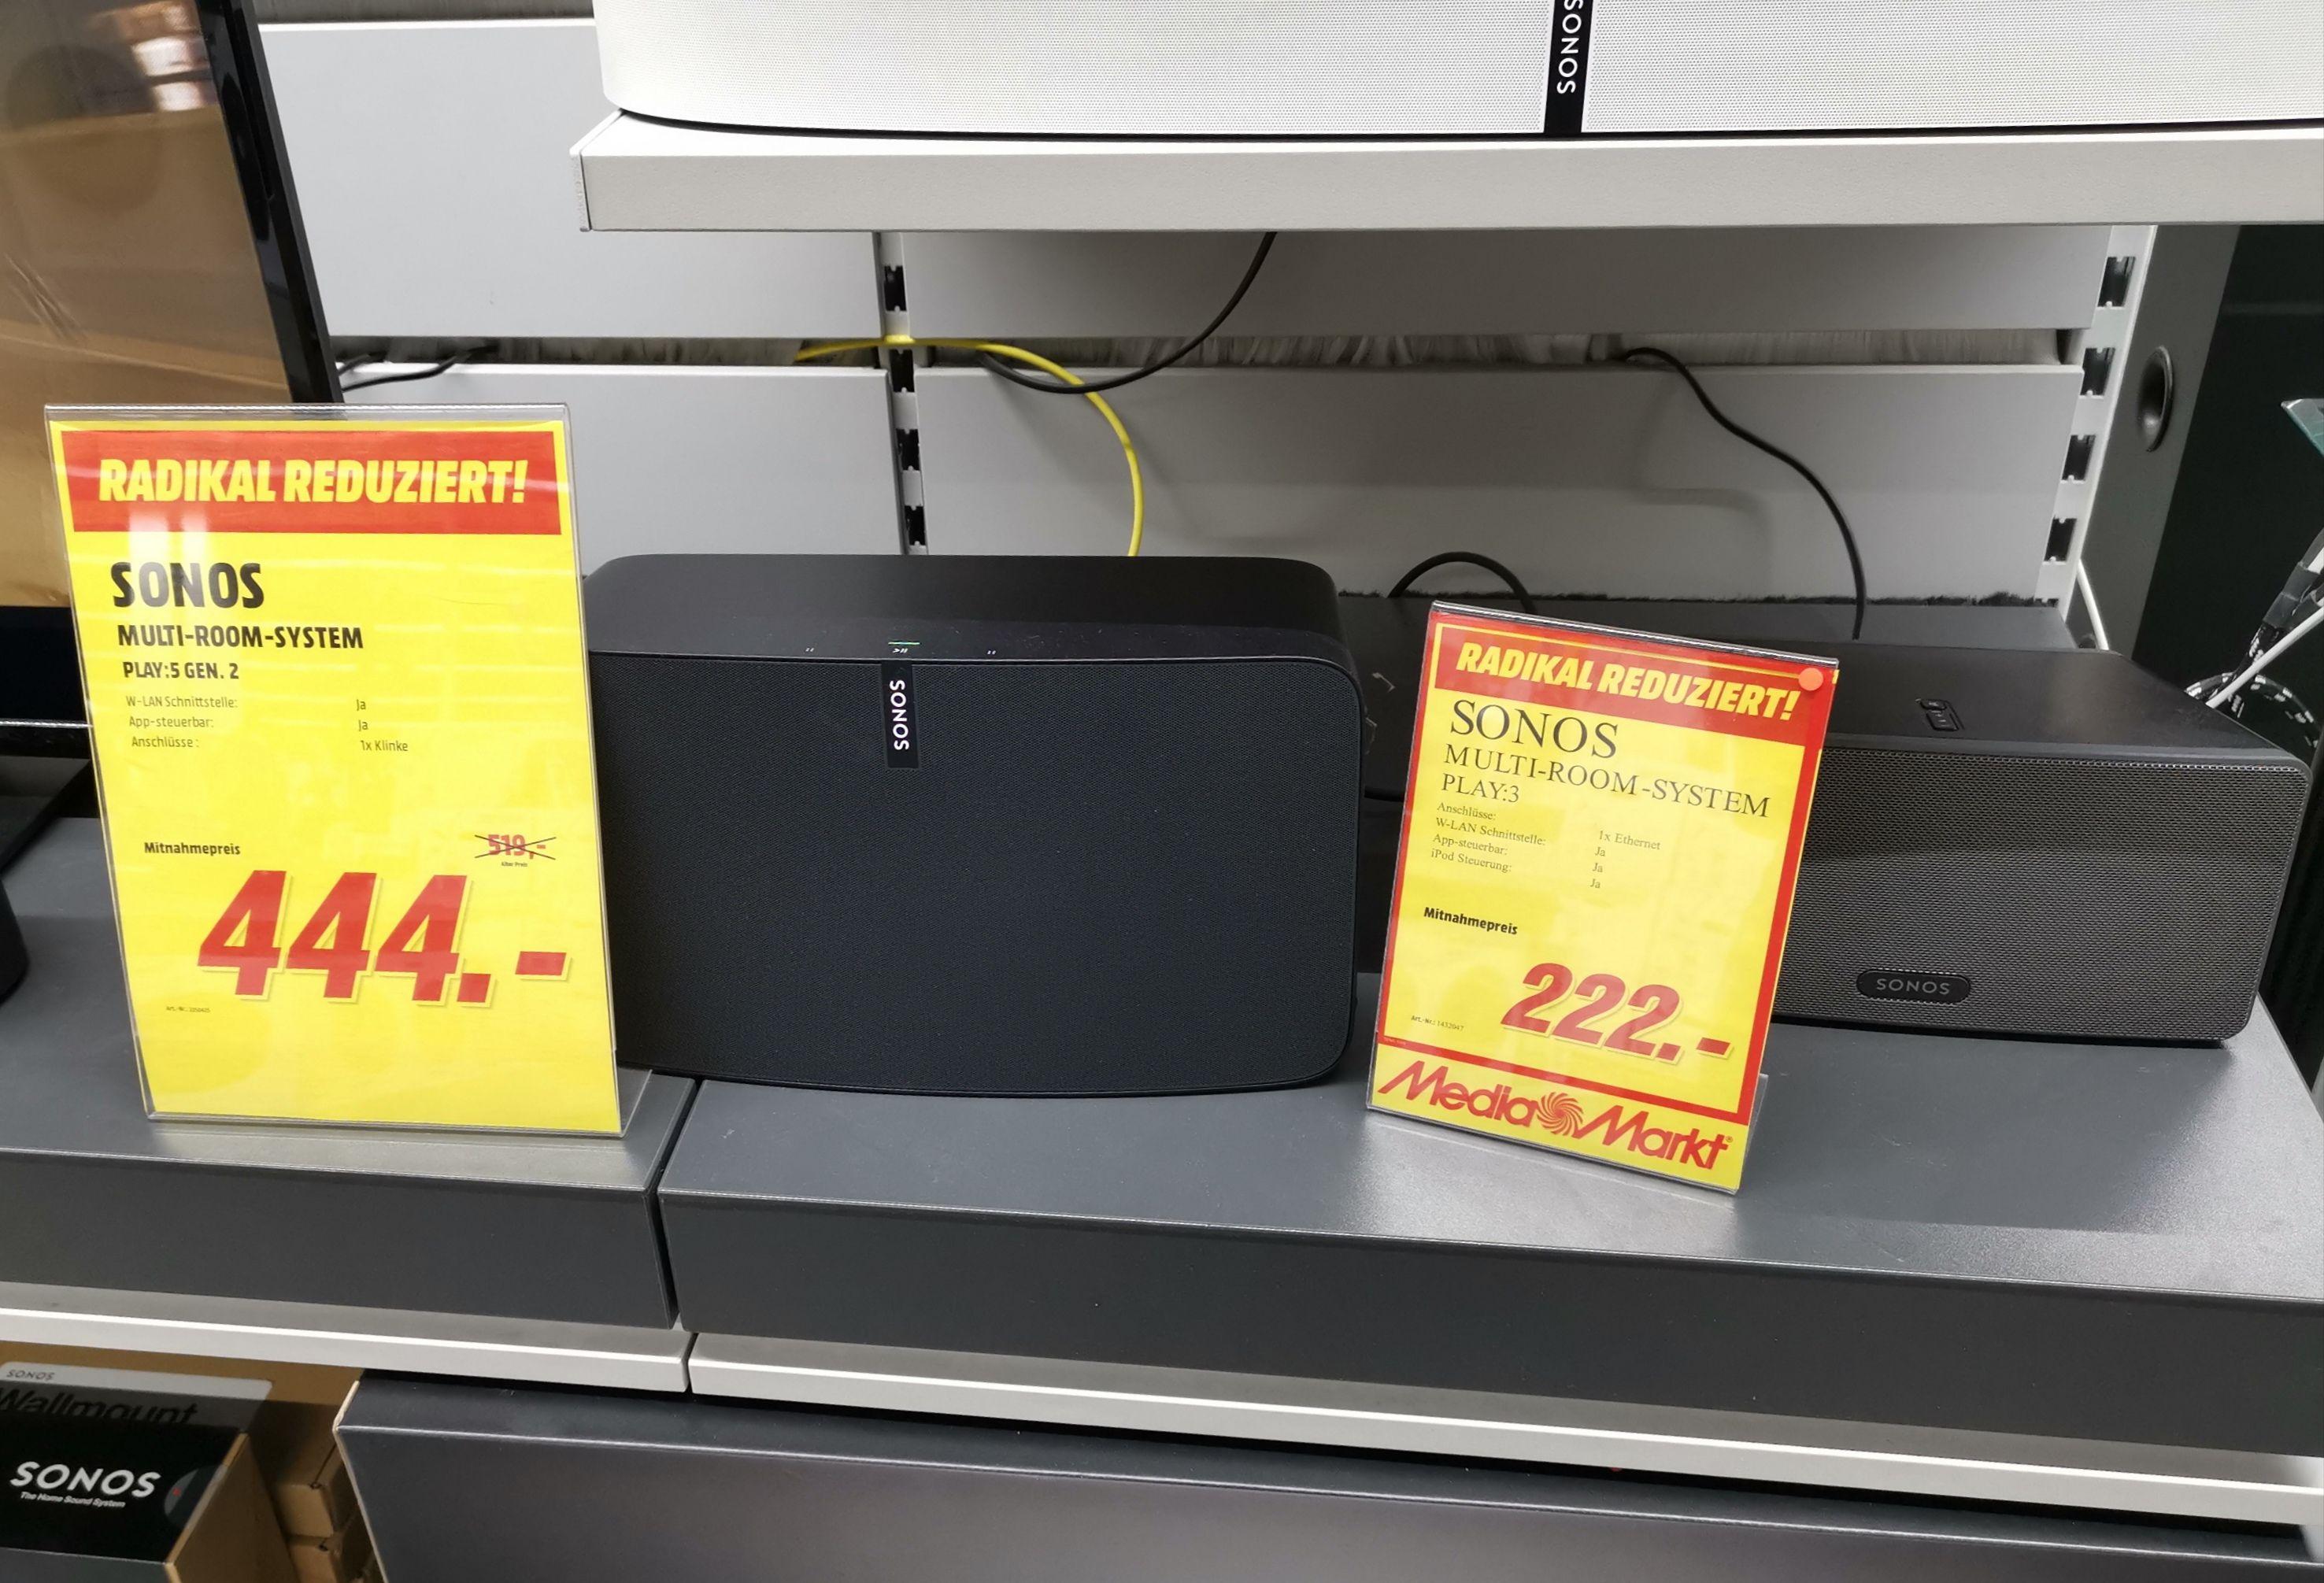 [Lokal MM Dresden] Sonos Play:3 (222€) oder Play:5 (444€)